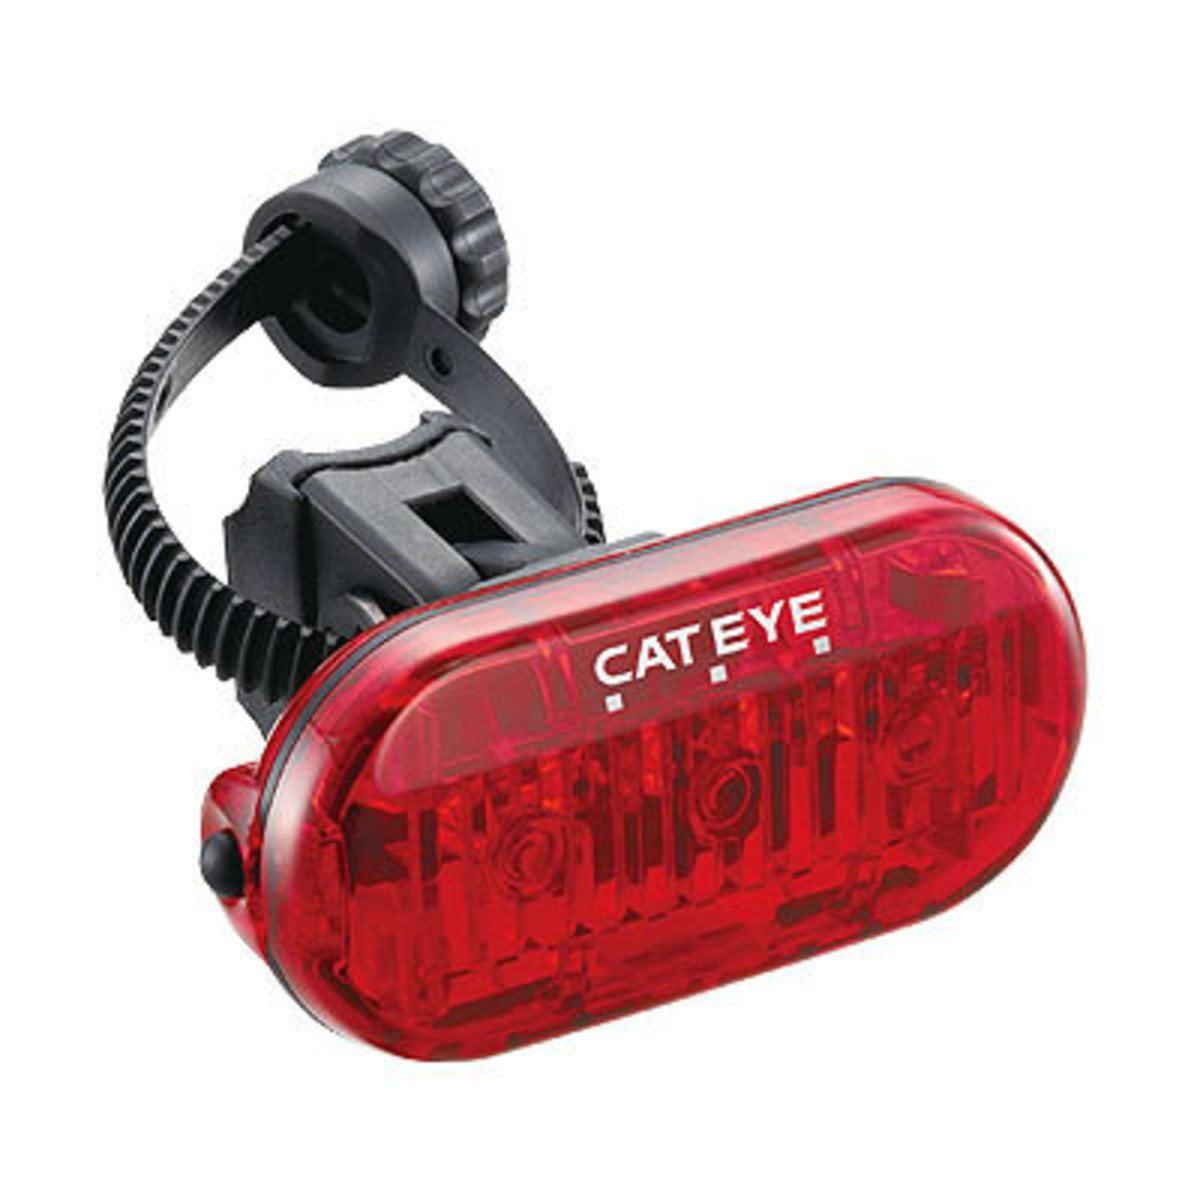 - Omni 3 Safety Light, TLLD135F Fits TLLD155F Night Waterproof Taillight Front Go Mount Combo Interior Black Headlight 194 TLLD135R festoon.., By CatEye